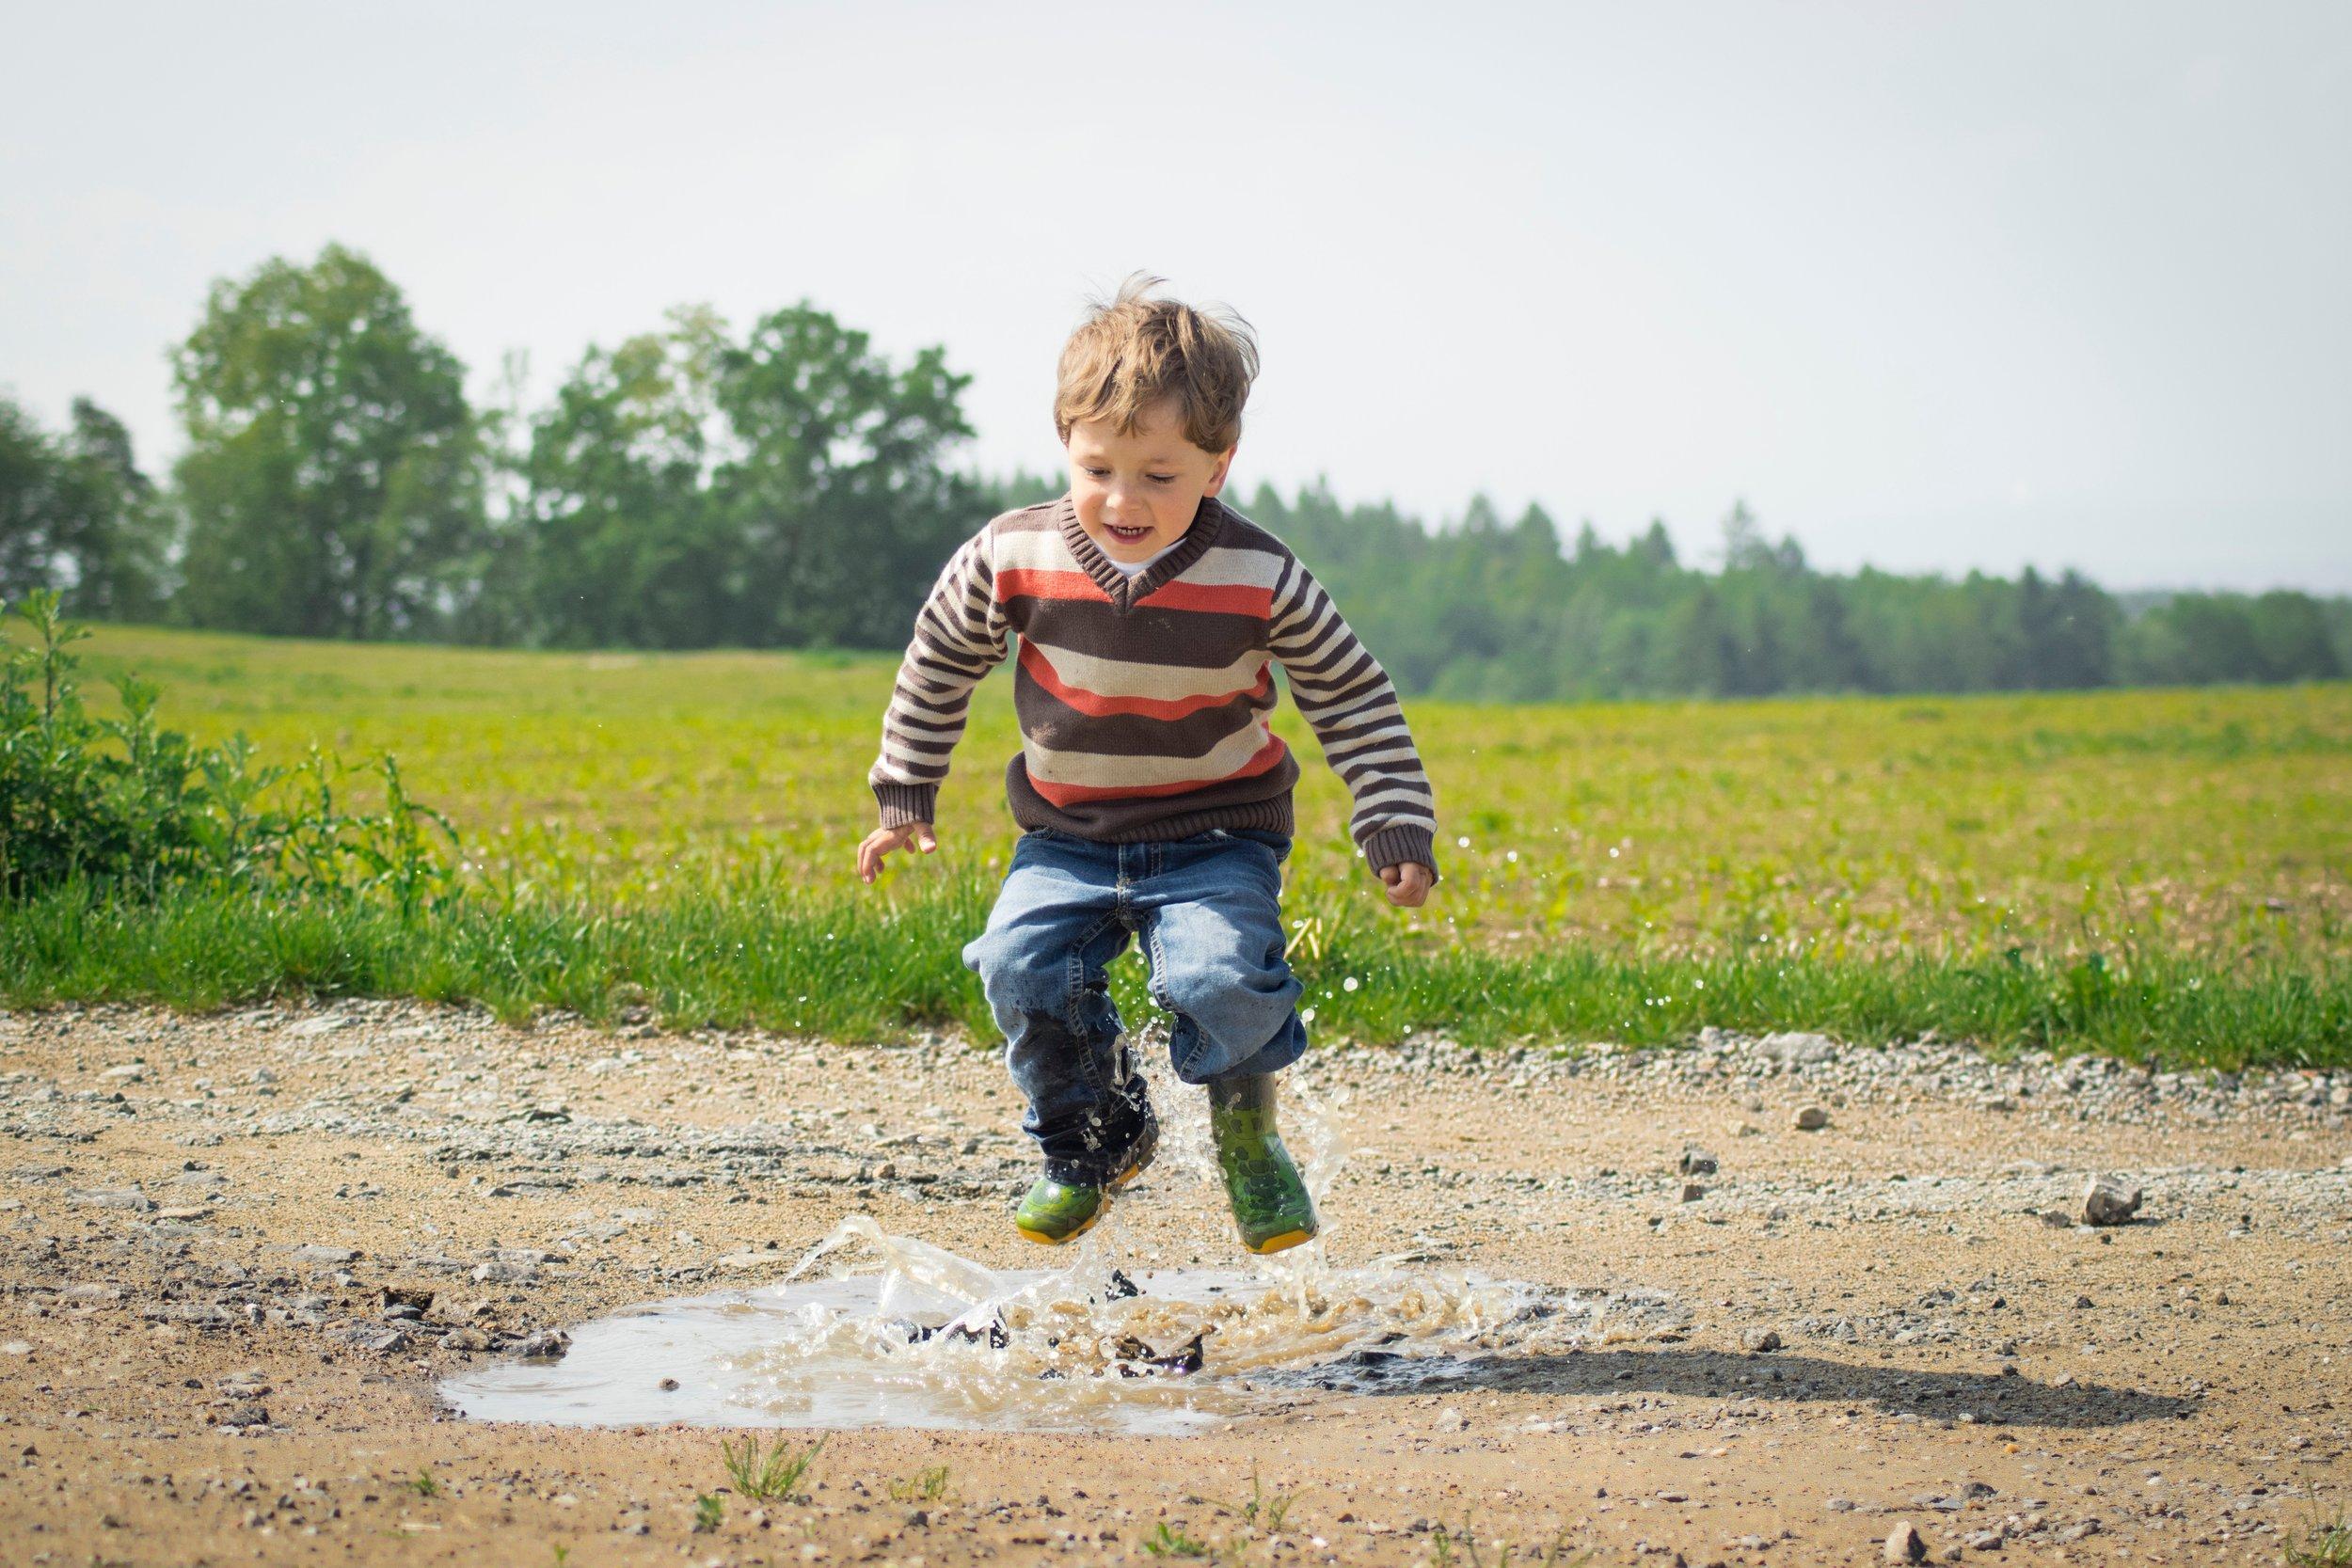 adorable-boy-child-1104014.jpg